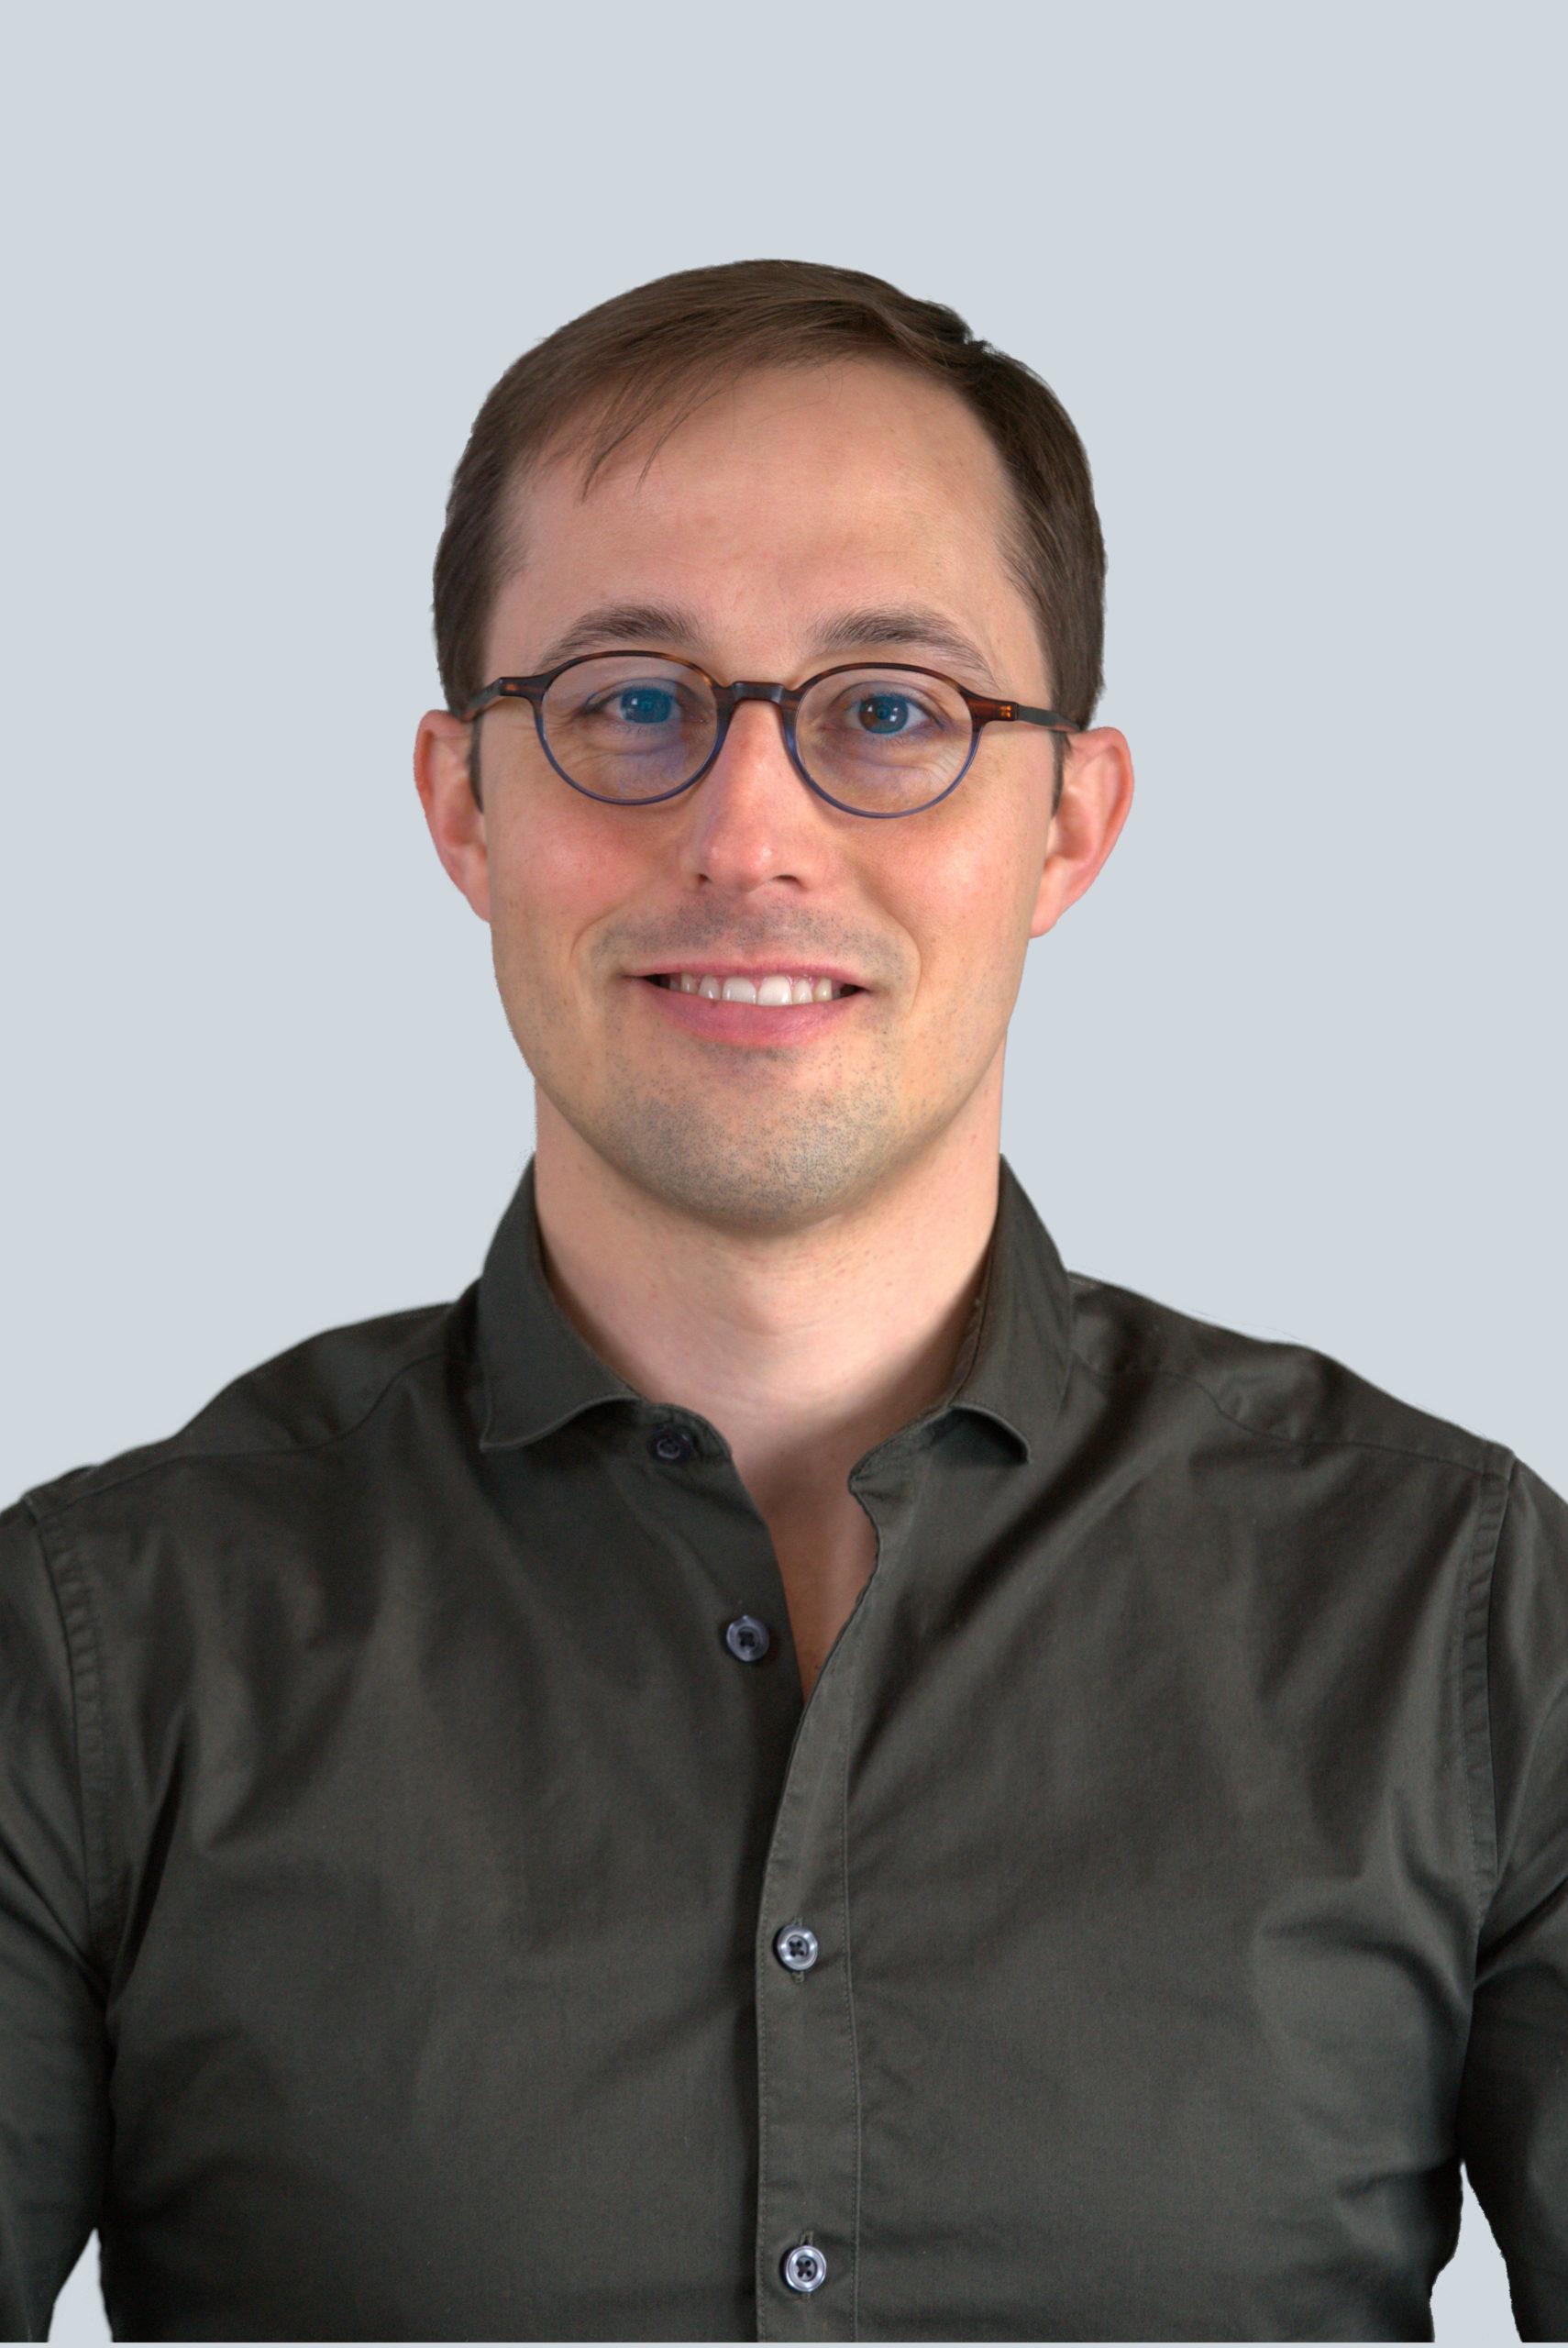 https://usercontent.one/wp/glostrupradikale.dk/wp-content/uploads/2021/03/Nicolai_DSC5966-v3-scaled.jpg